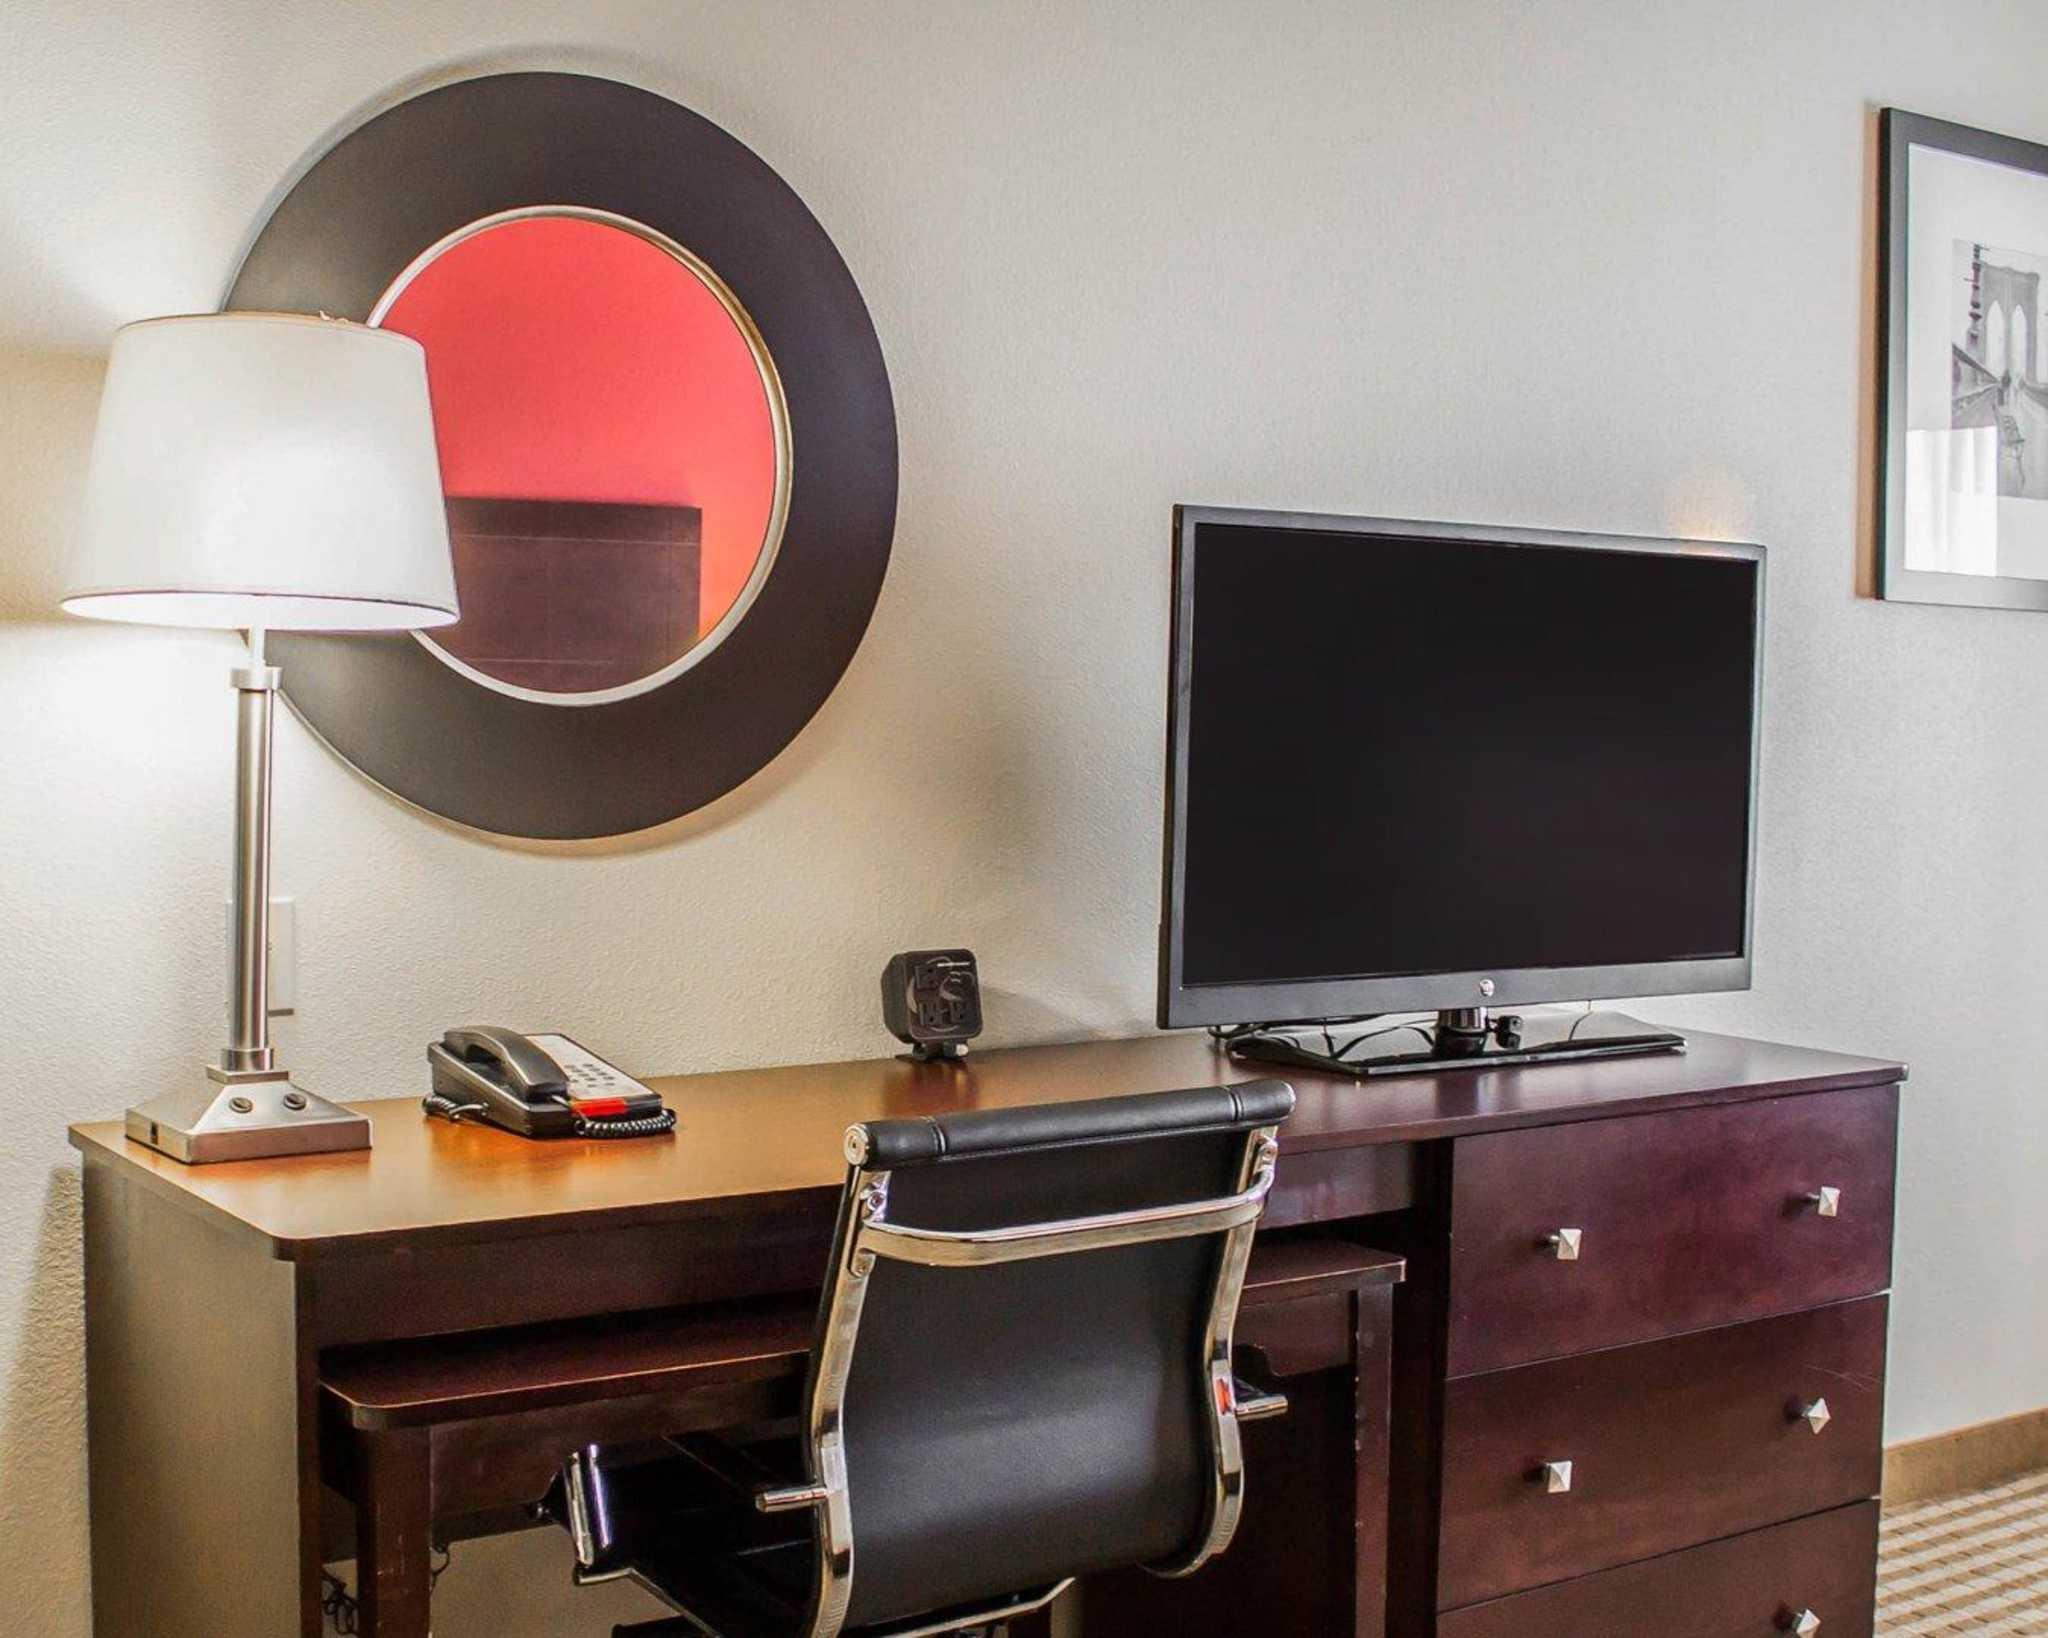 Comfort Suites East Broad at 270 image 27